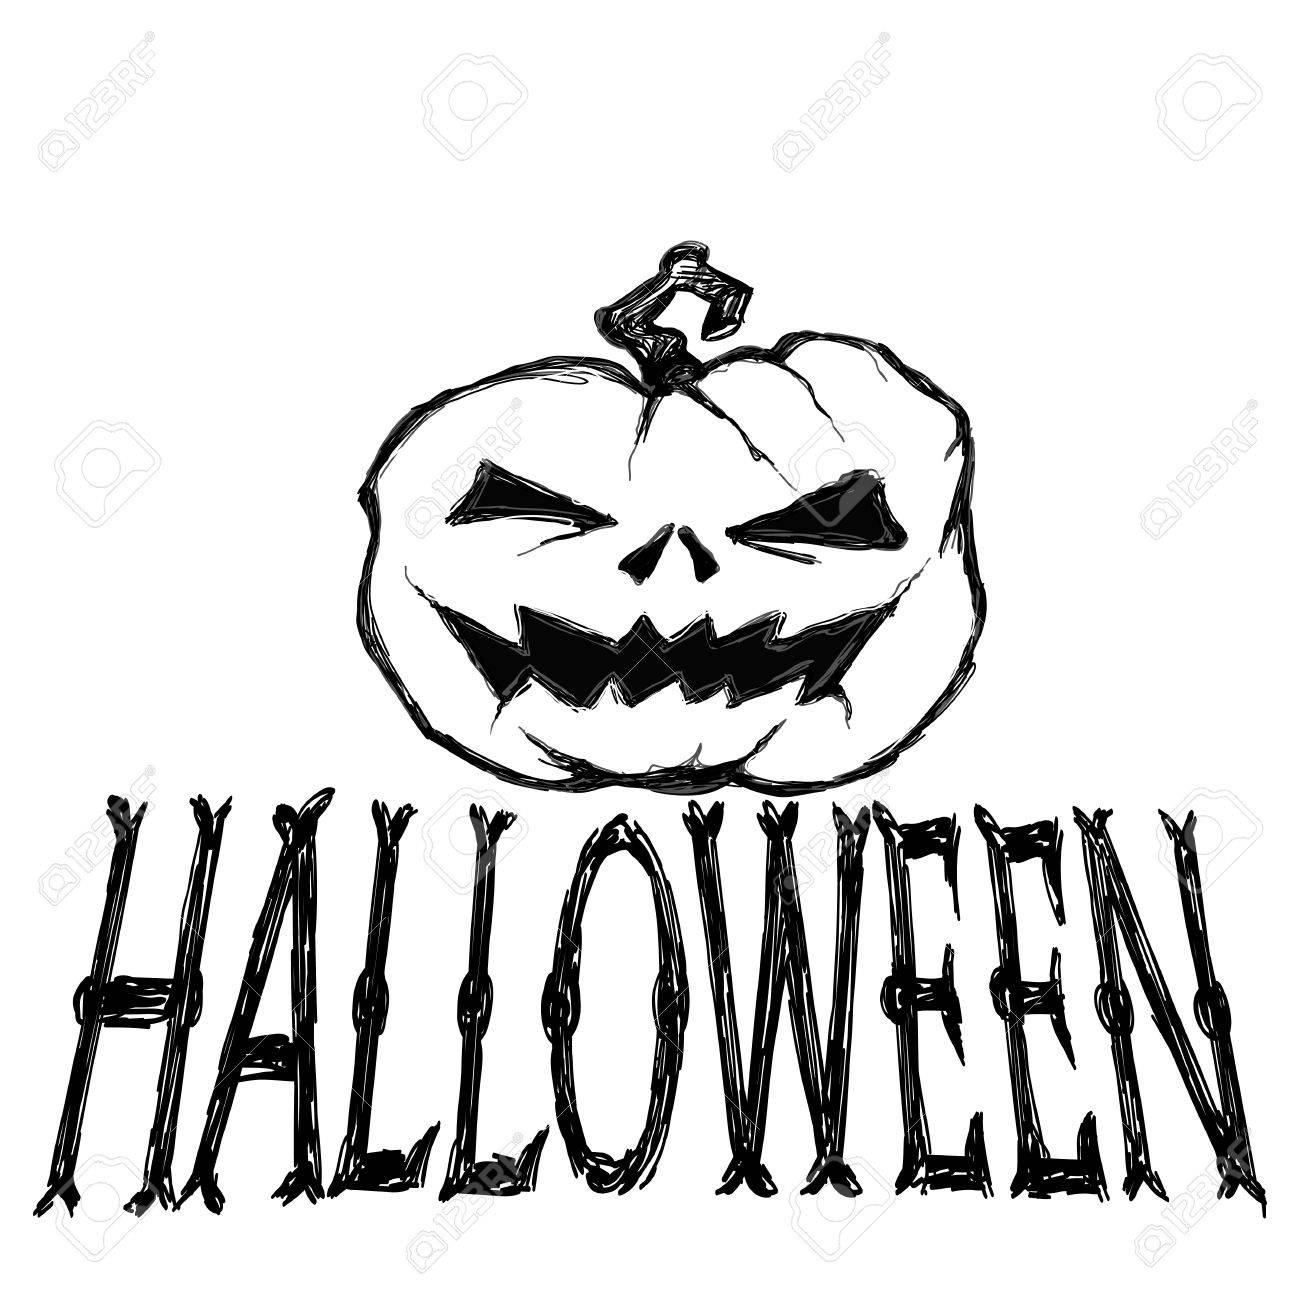 Creepy Halloween Pumpkin Drawings.Halloween Vector Illustration Creepy Pumpkin And Letters Drawing